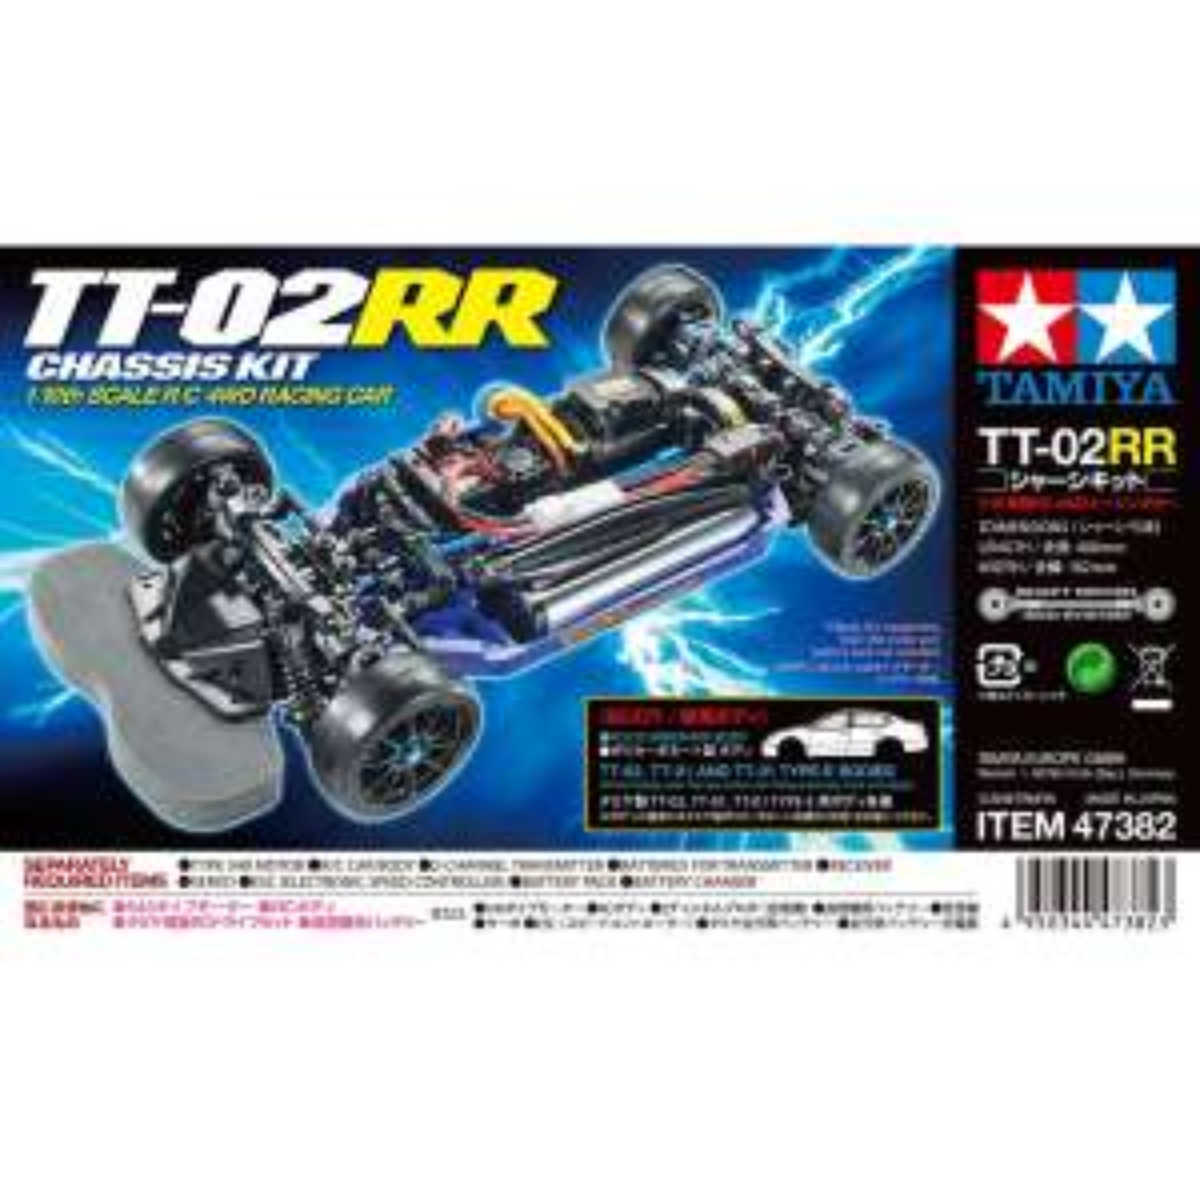 Tamiya 47382 TT-02RR Chassis Bausatz (viele Tuning Teile)